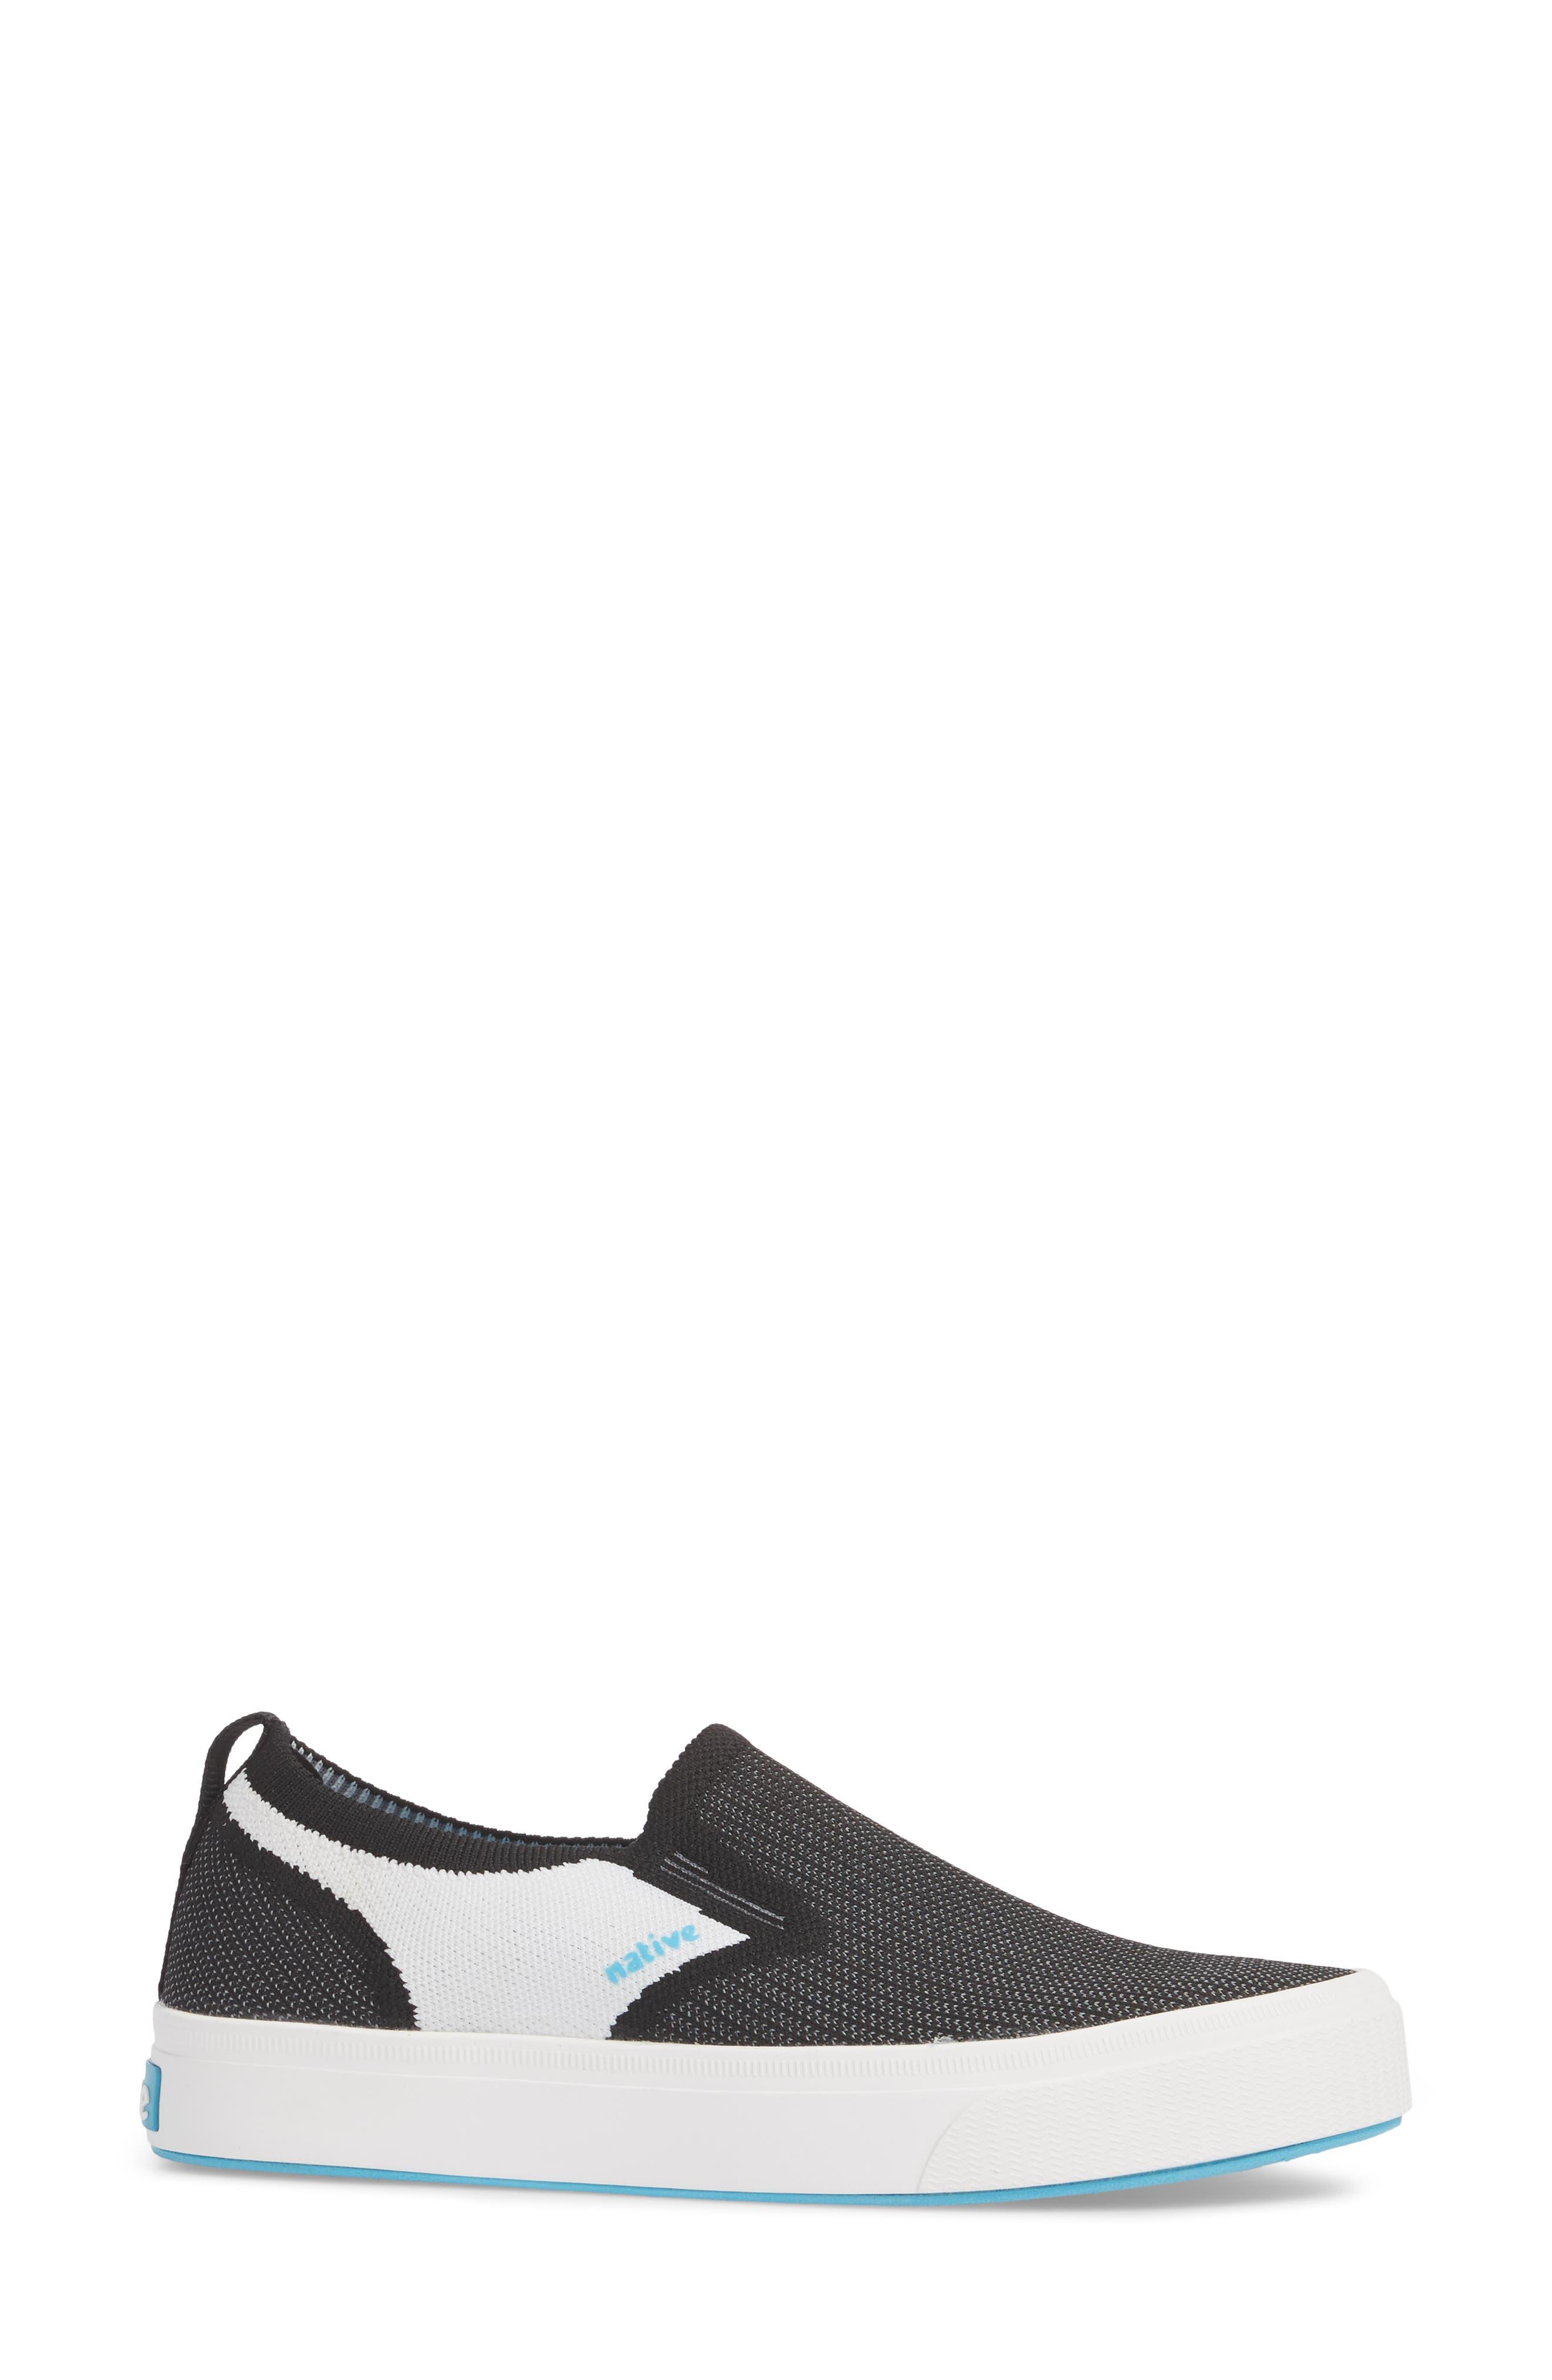 Miles Liteknit Slip-On Sneaker,                             Alternate thumbnail 3, color,                             JIFFY BLACK/ SHELL WHITE